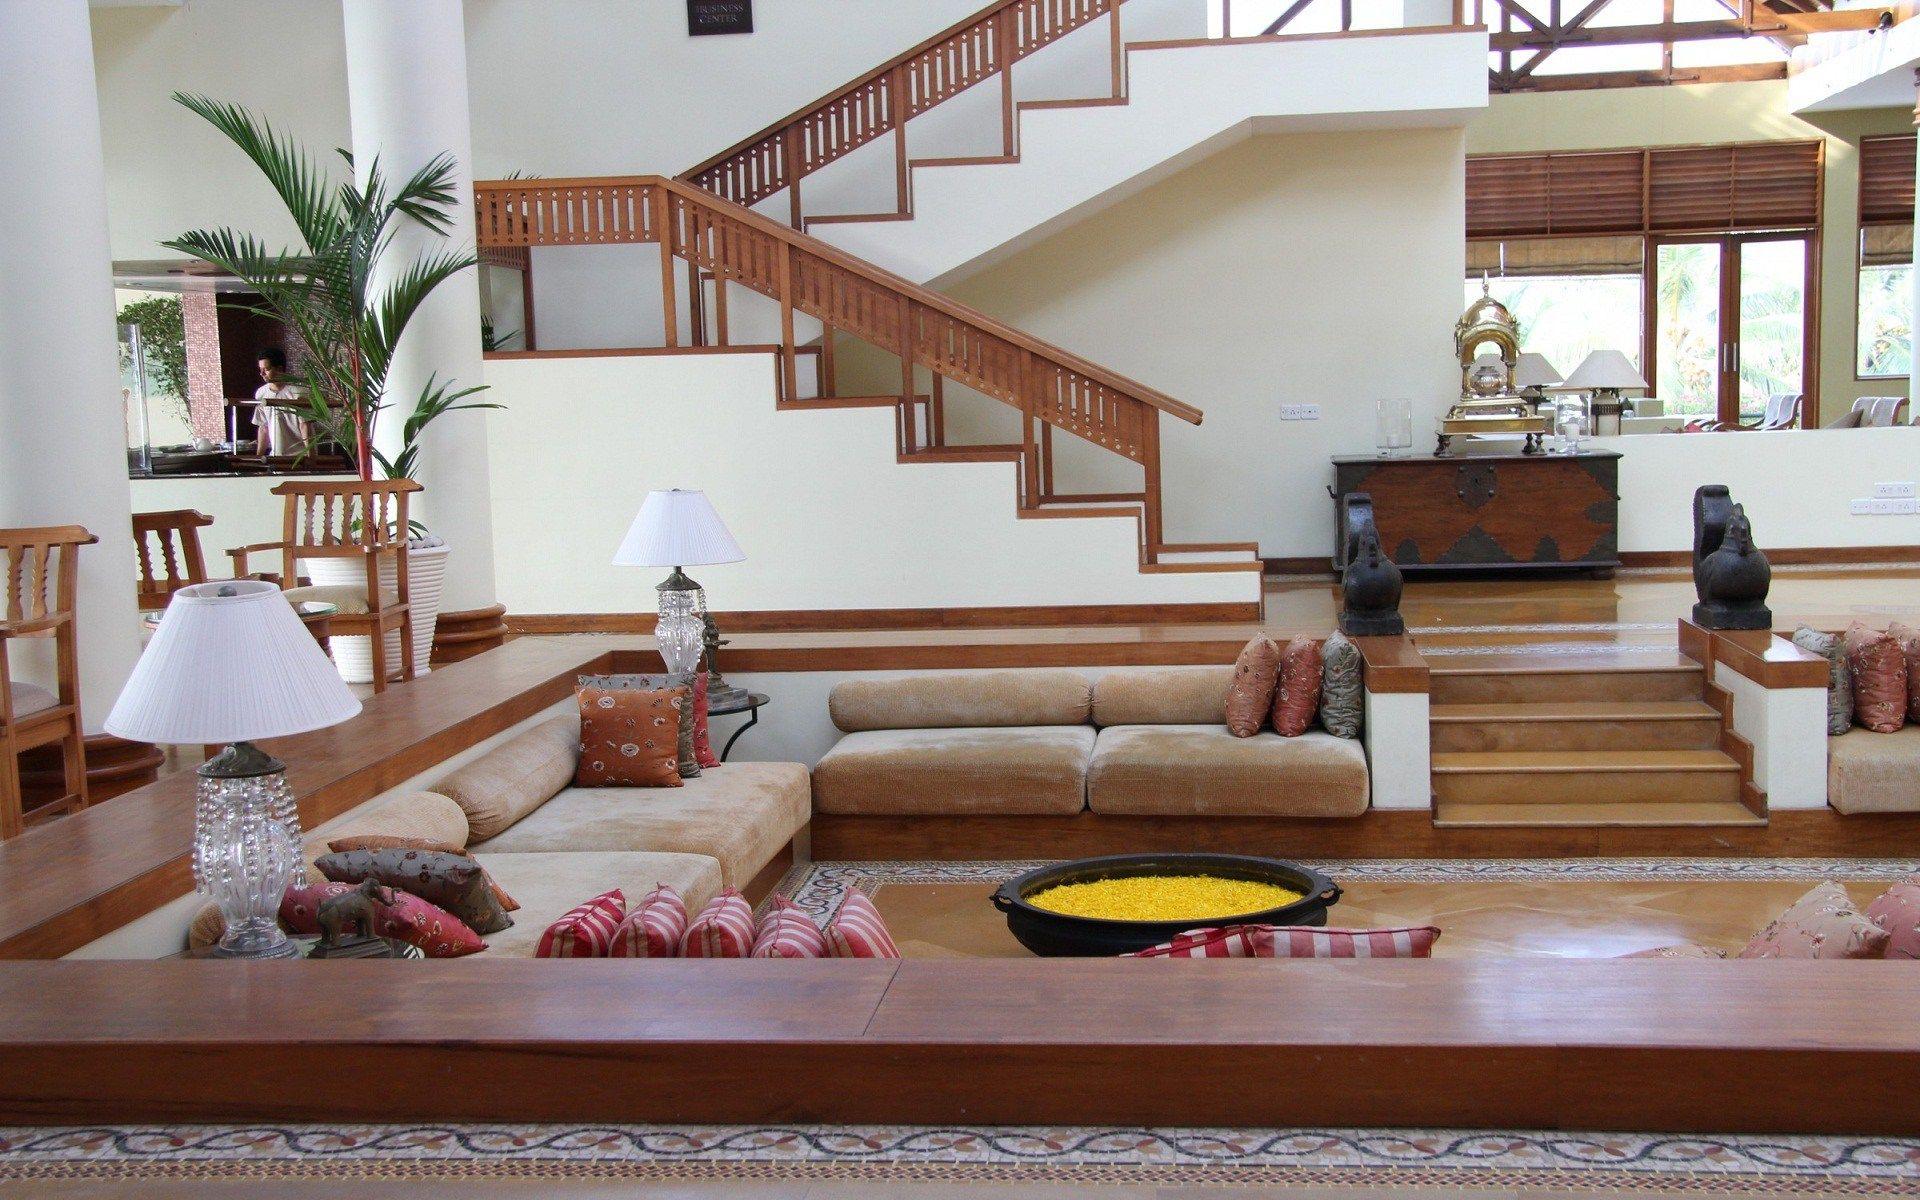 Interior Indoor Design Sweet Home Hd Wallpapers Rocks Home Interior Design Arabic Trend Home Design Decor